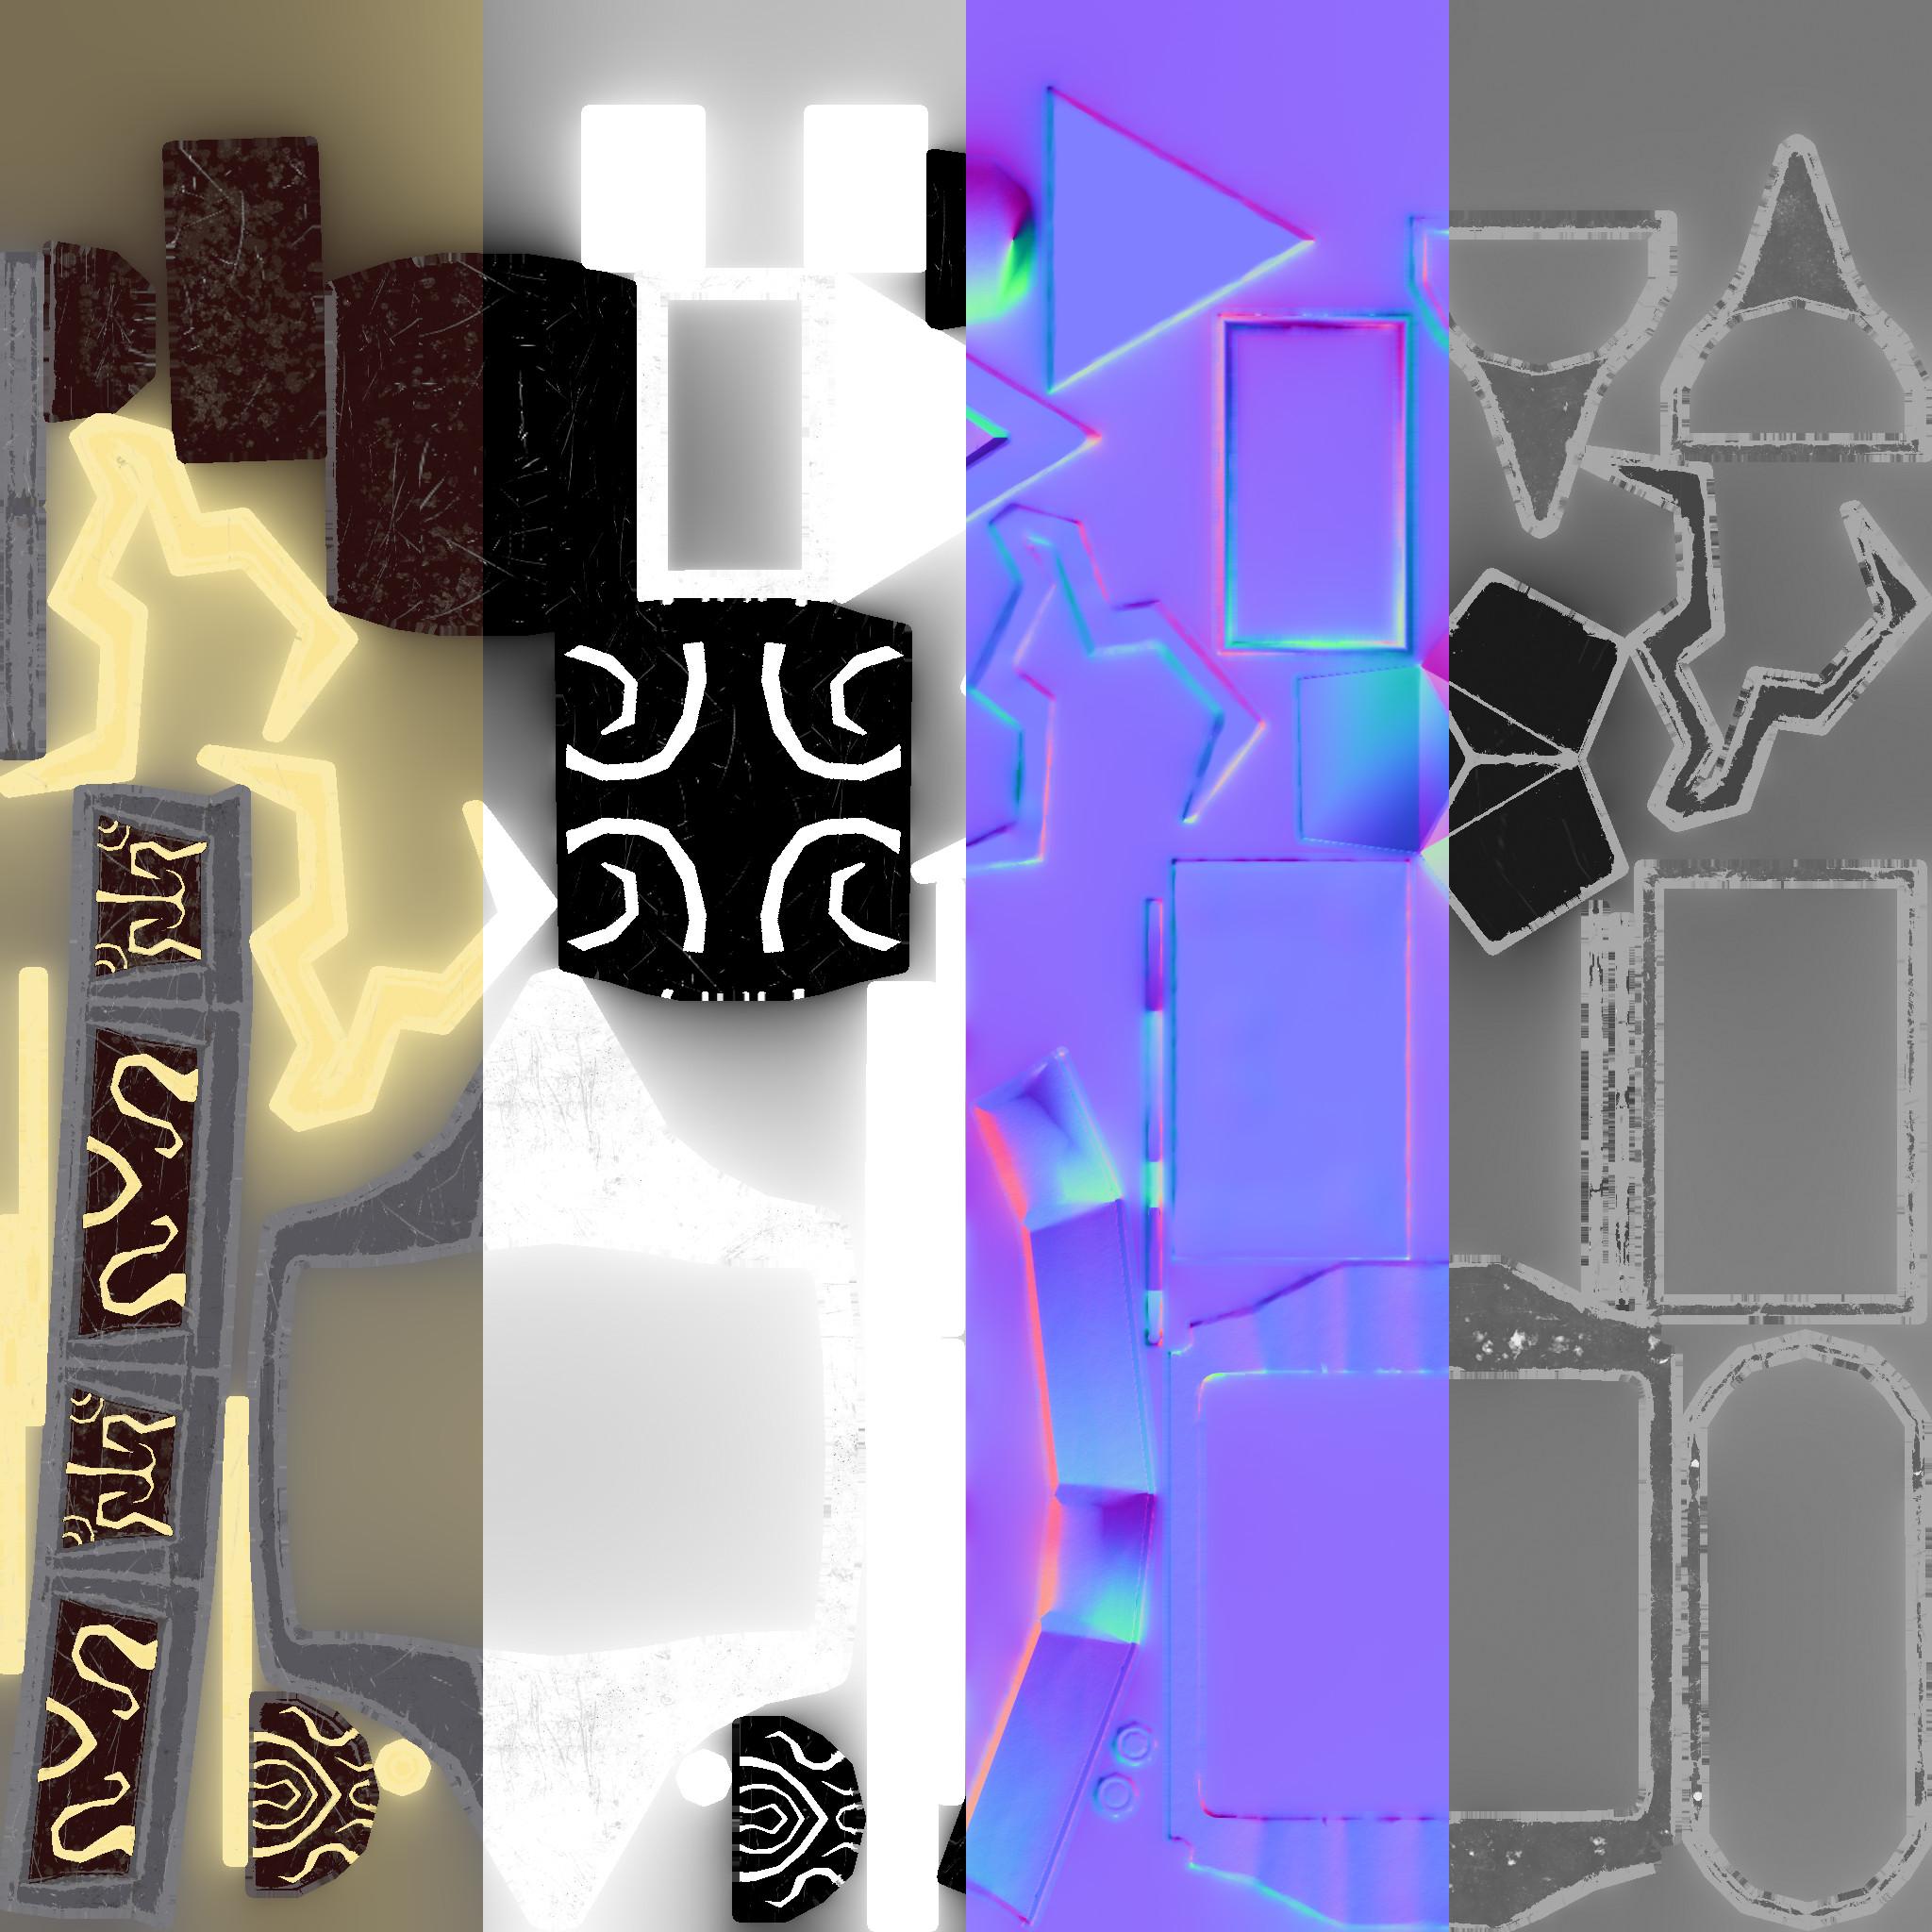 Albedo / Metallic / Normal / Roughness